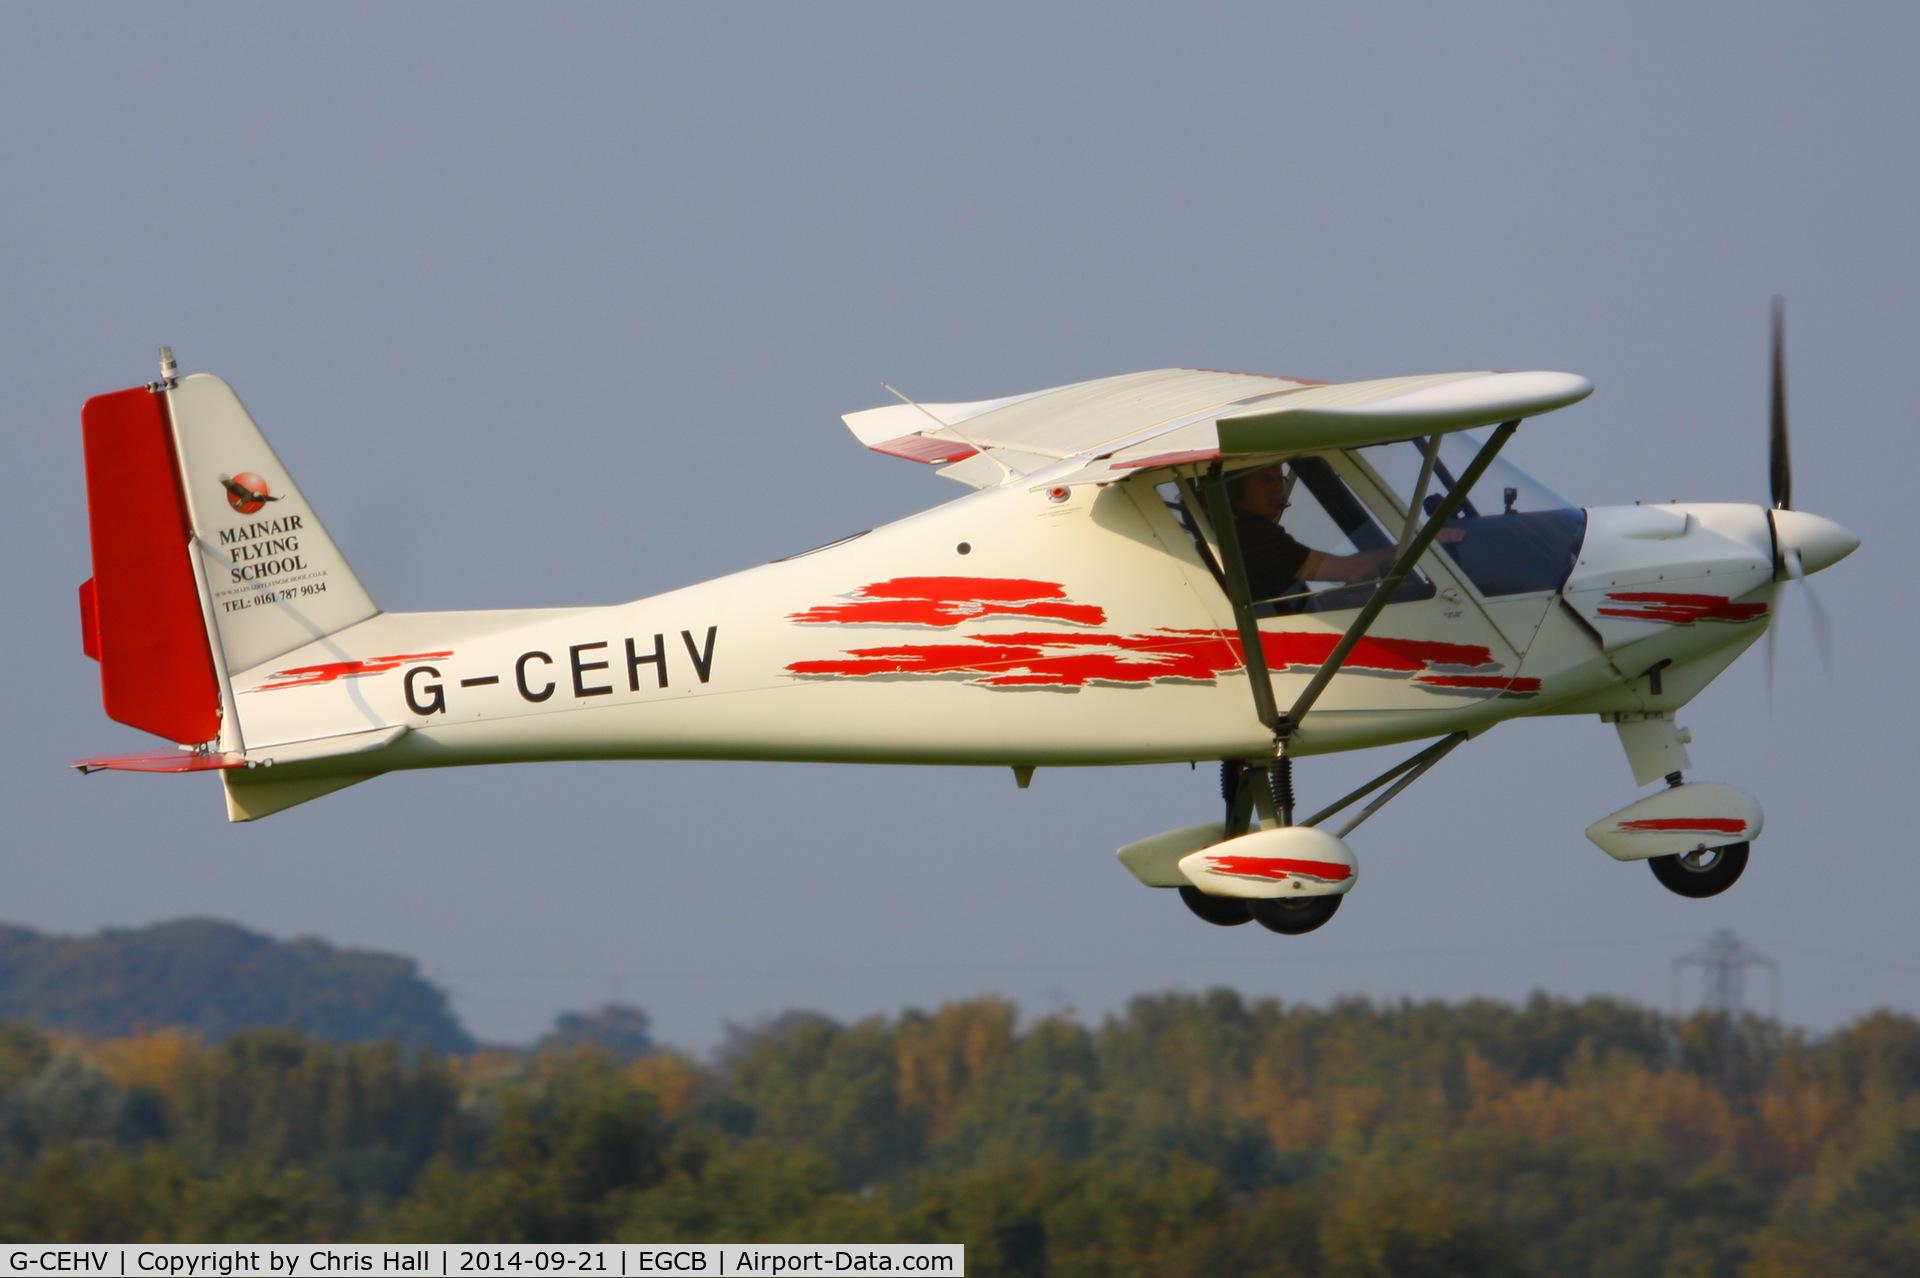 G-CEHV, 2006 Comco Ikarus C42 FB80 C/N 0610-6854, Mainair Microlight School